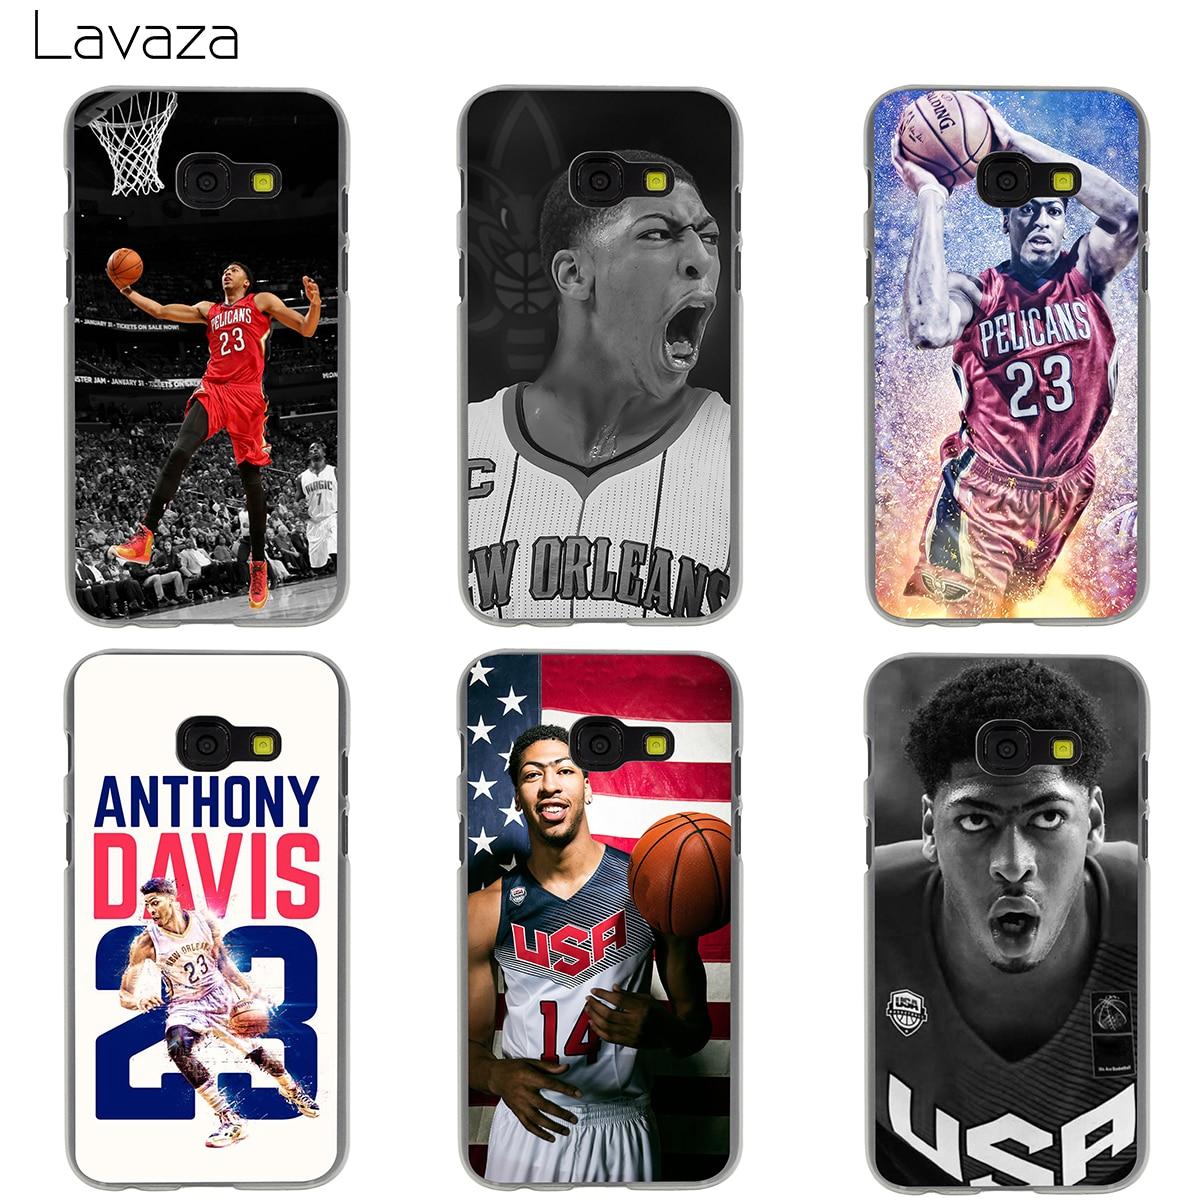 Lavaza Энтони Дэвис Блейк Кармело Энтони Крис Пол чехол для Samsung Galaxy J1 J2 J7 A3 Примечание 3 5 Grand prime 2016